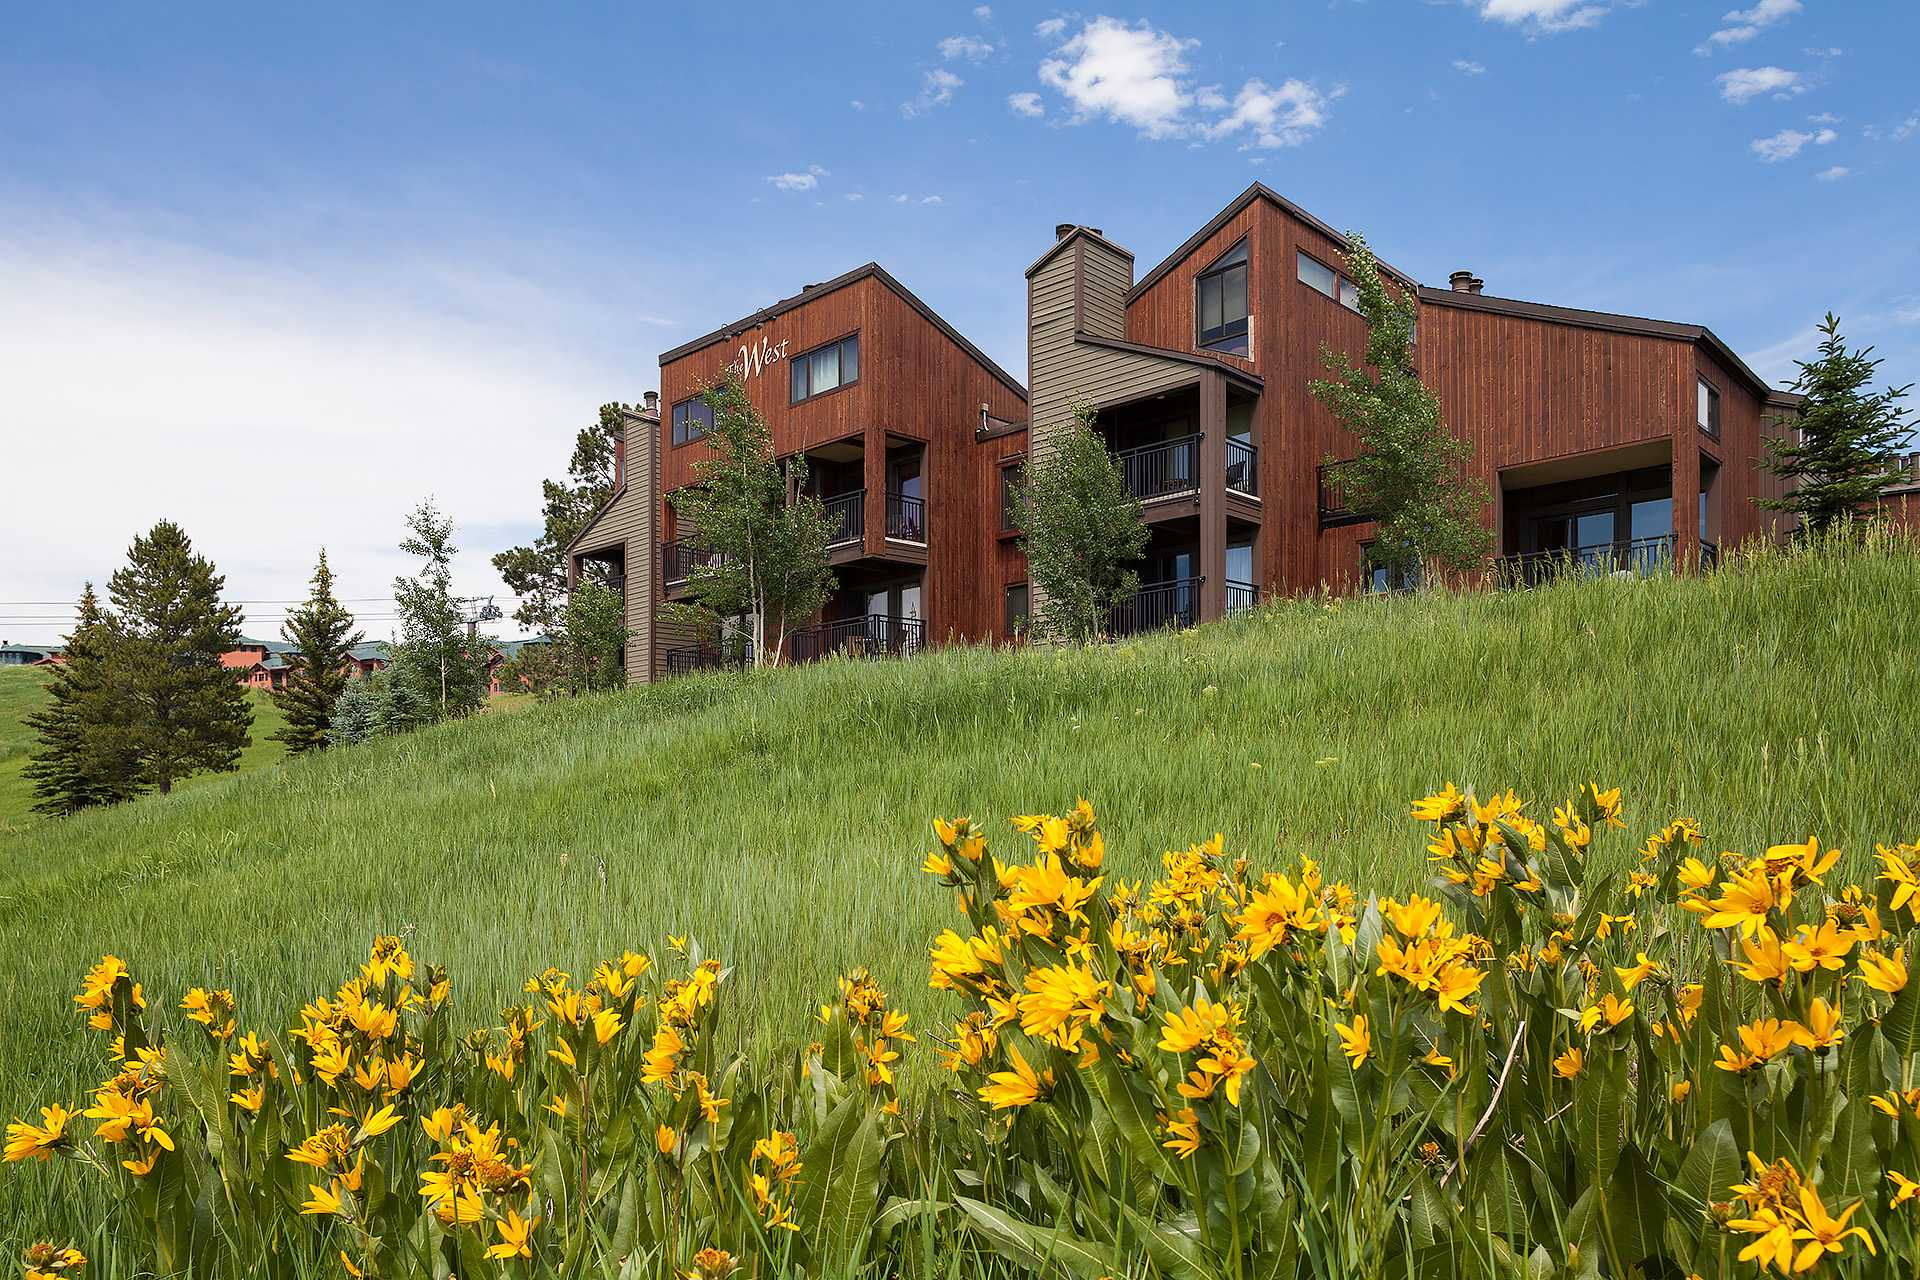 W3502: The West Condominiums